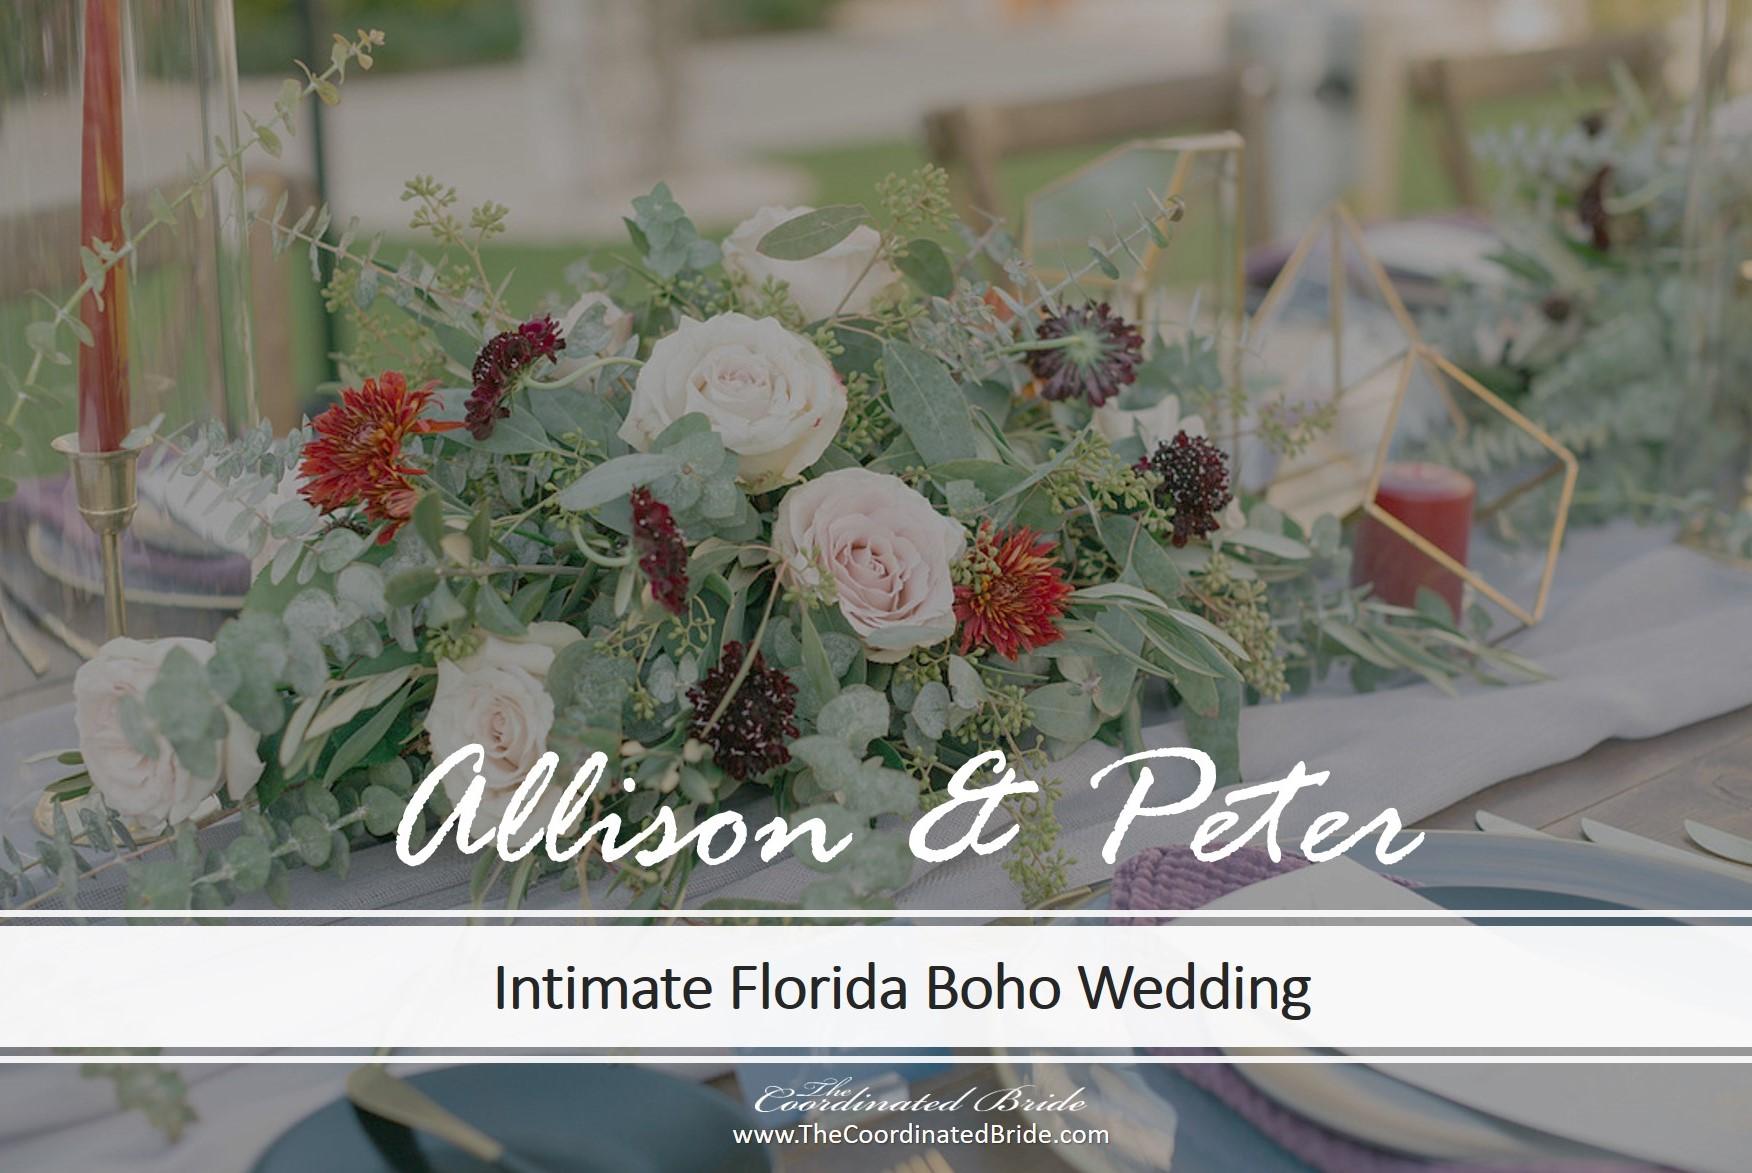 Intimate Boho Wedding at Belleview Inn, Allison & Peter